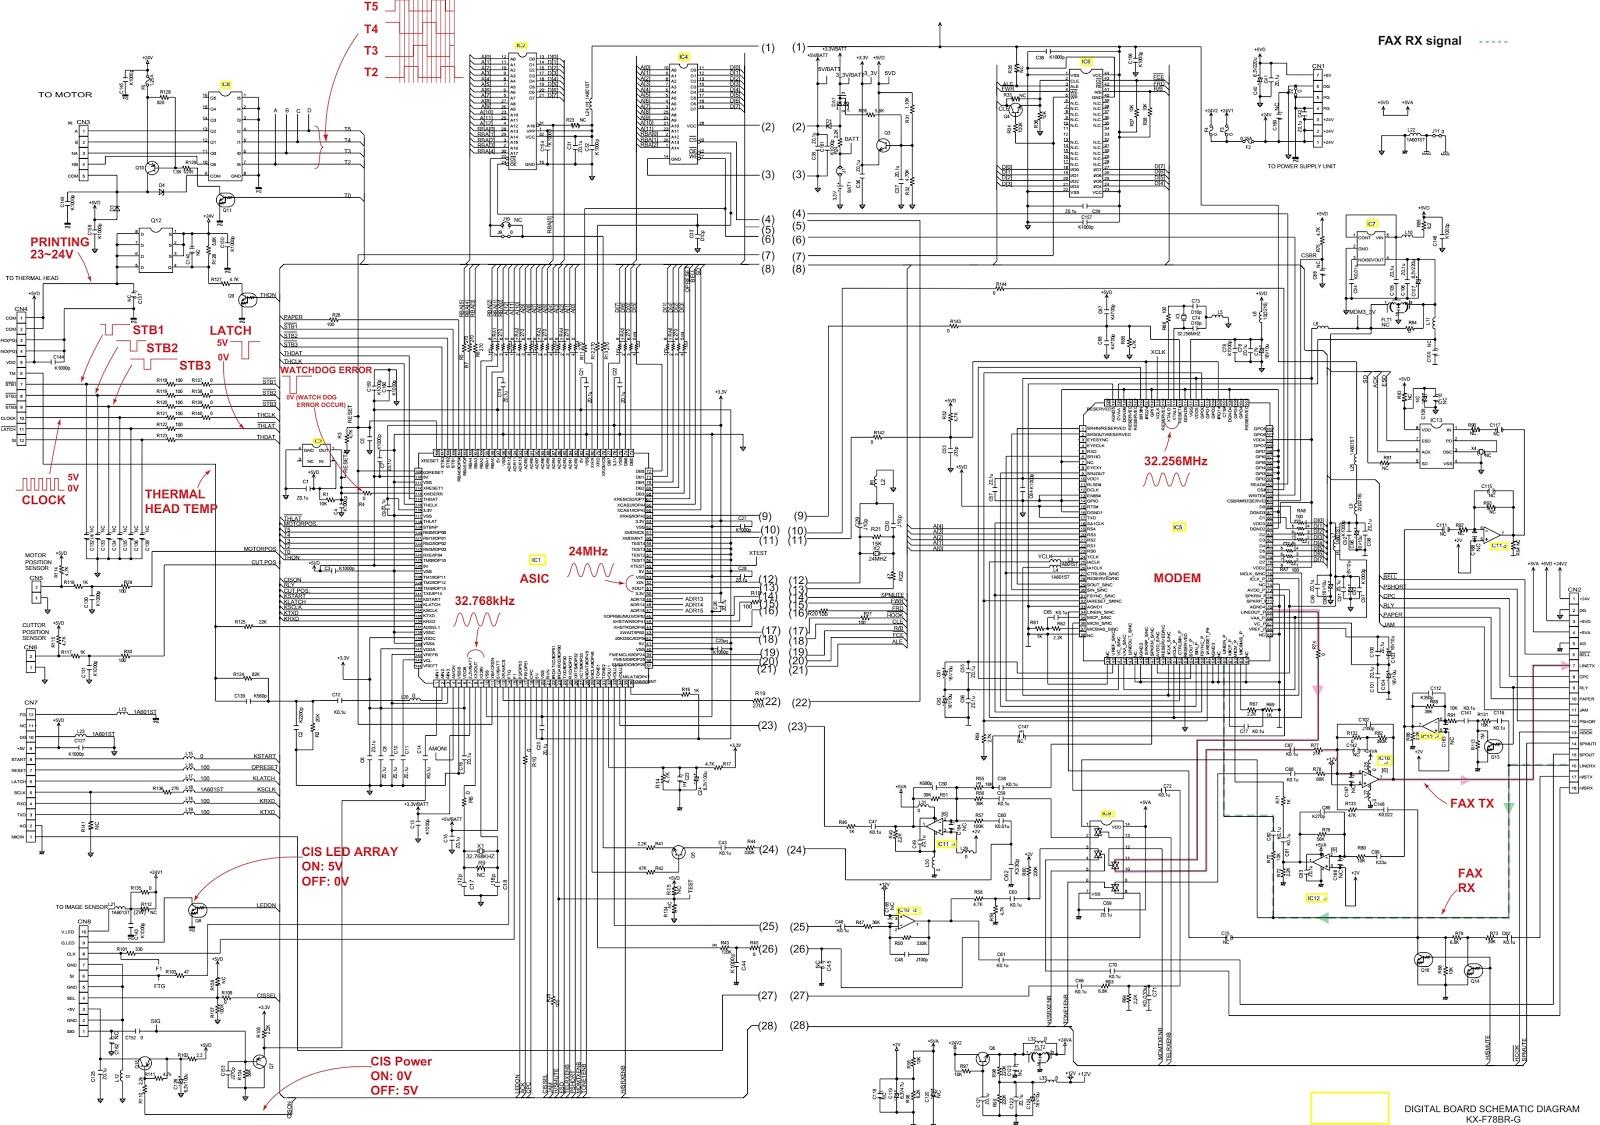 Panasonic KXFT78BRG POWER SUPPLY BOARD SCHEMATIC DIAGRAM